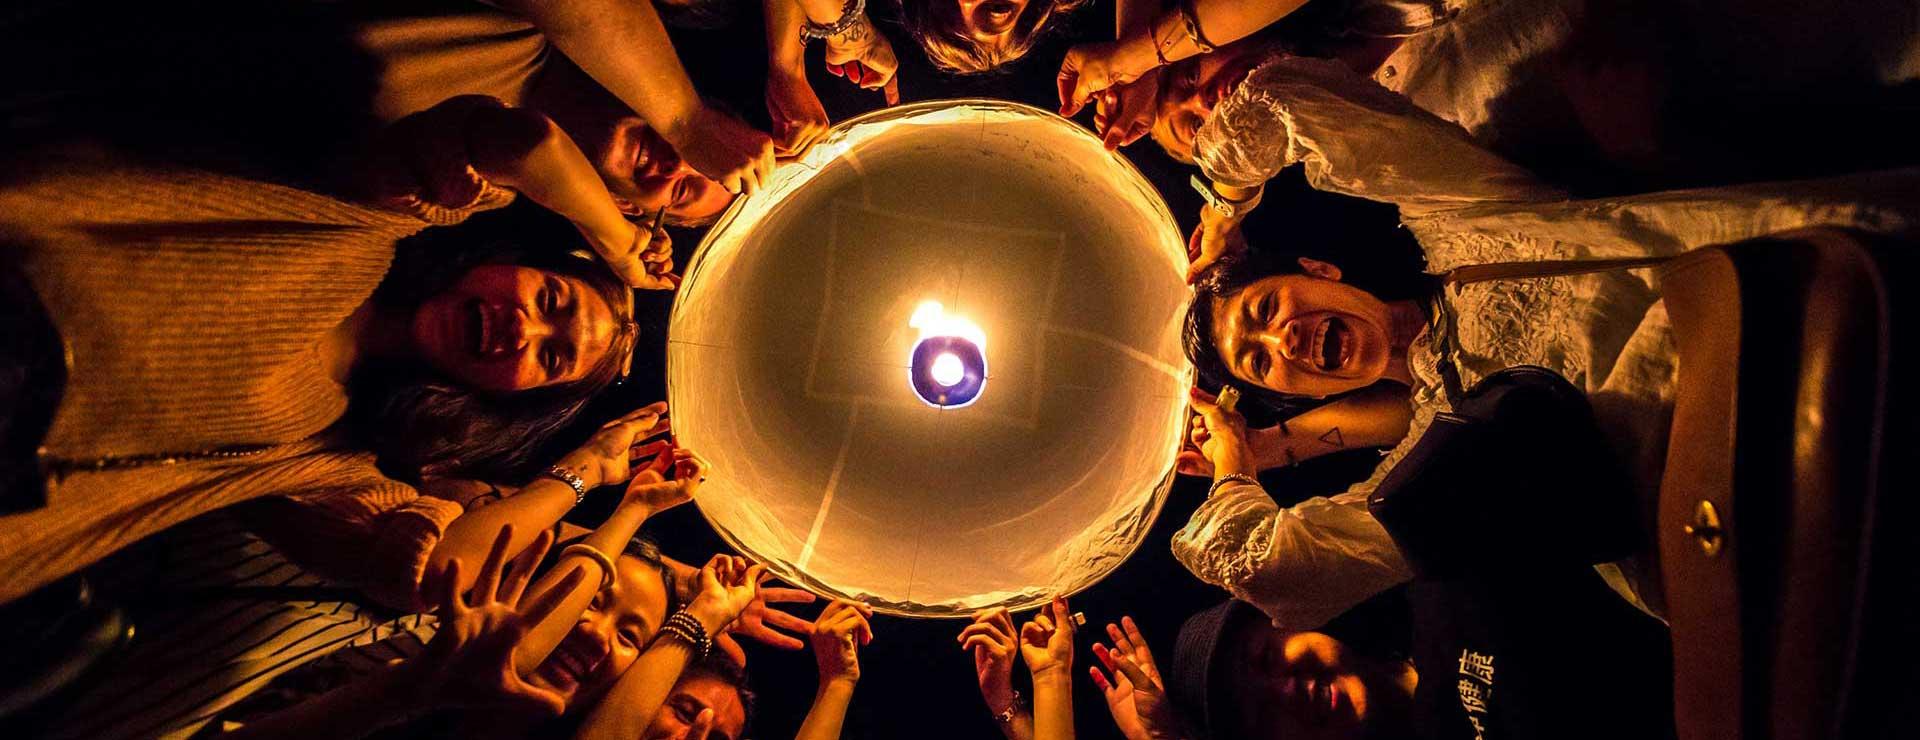 chiang mai lantern fest